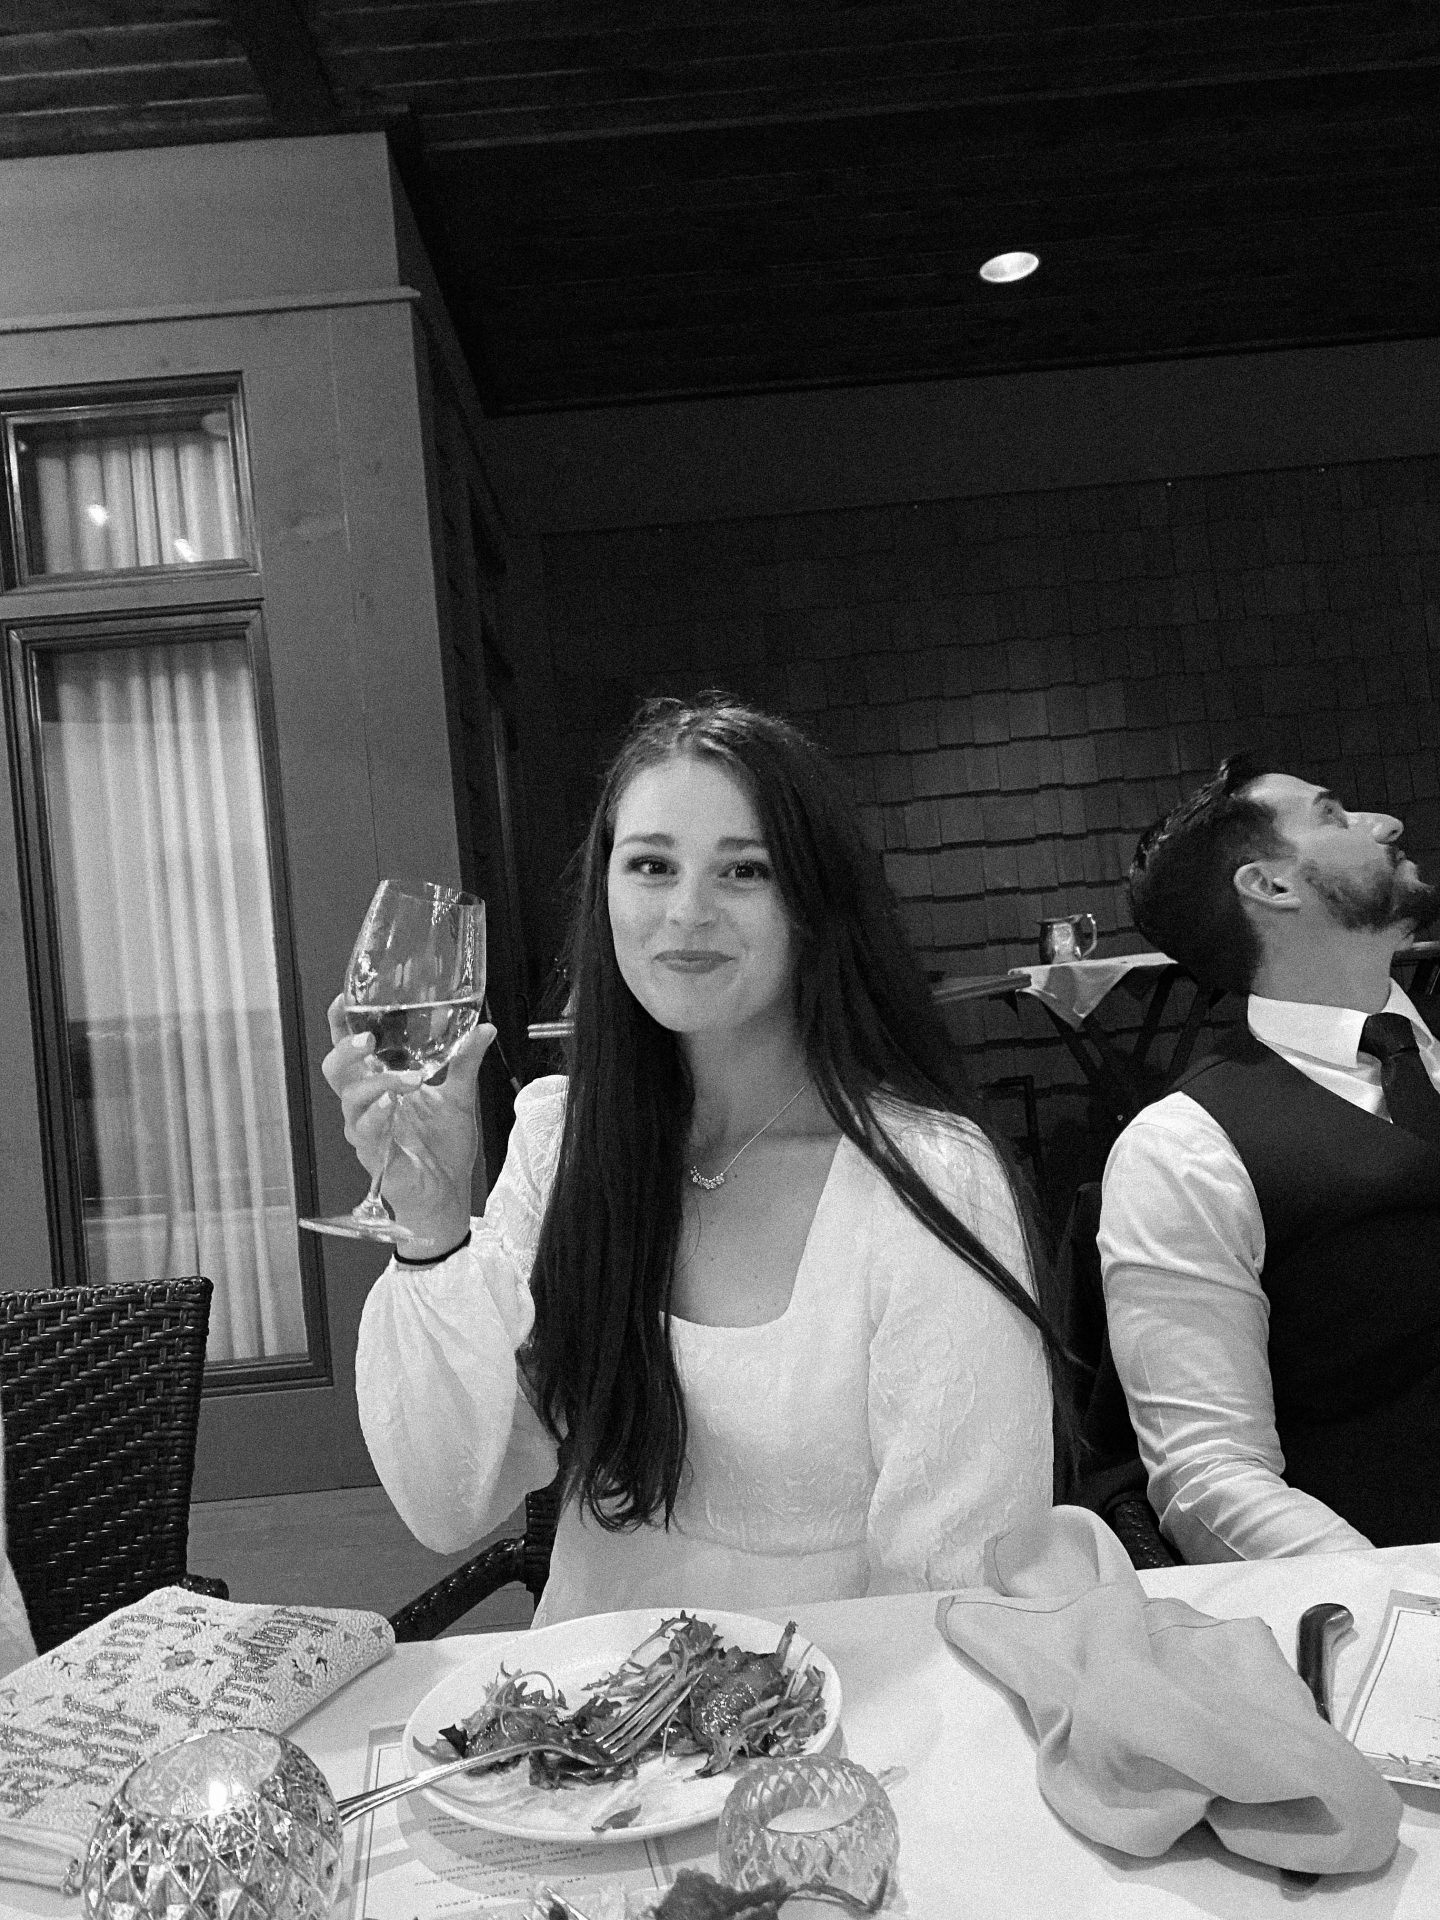 wedding weekend, Brevard, lake toxaway wedding, lake toxaway country club rehearsal dinner, the greystone inn wedding, simply taralynn wedding, small romantic wedding, family wedding, weekend lake toxaway, farm to table, rehearsal dinner, country club dinner wedding, golf course, lake toxaway, Rockefeller suite